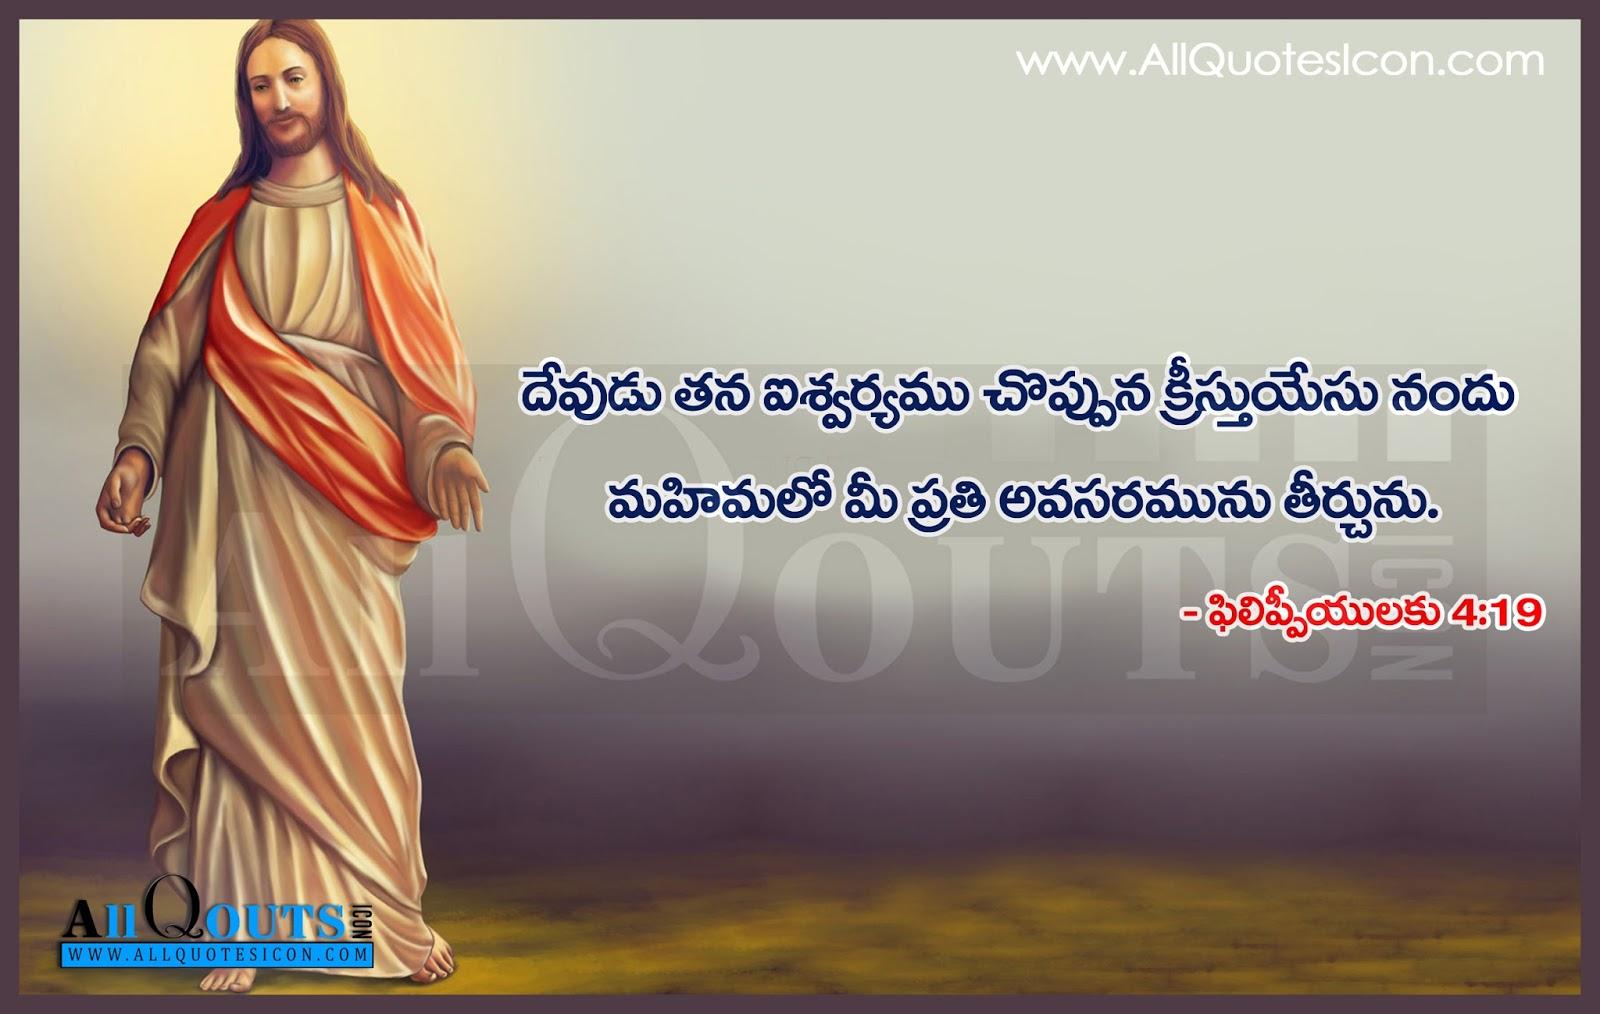 Jesus Christ Quotes In Telugu Hd Wallpapers Best Bible Verses Telugu Quotations Images Www Allquotesicon Com Telugu Quotes Tamil Quotes Hindi Quotes English Quotes